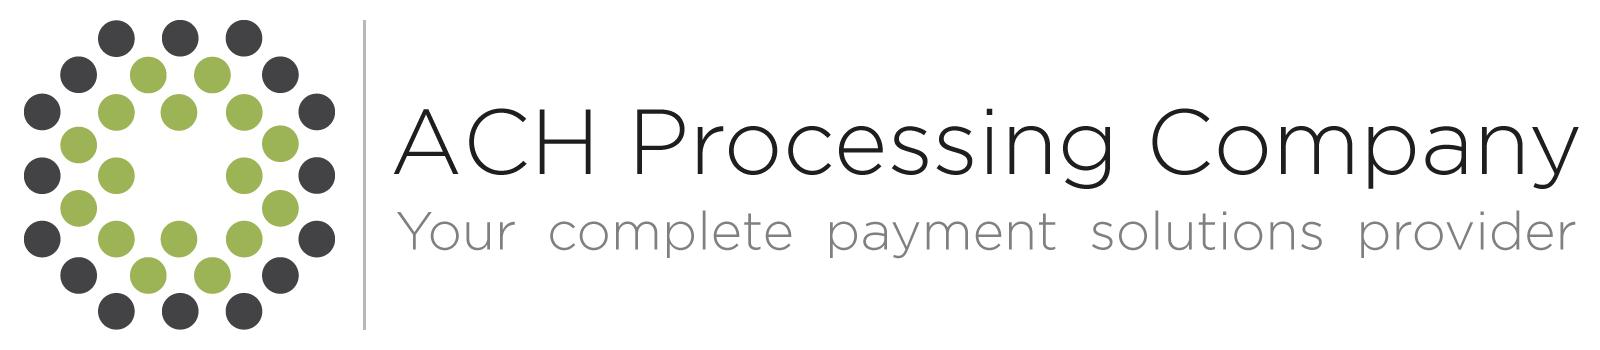 ACH Processing Company Logo